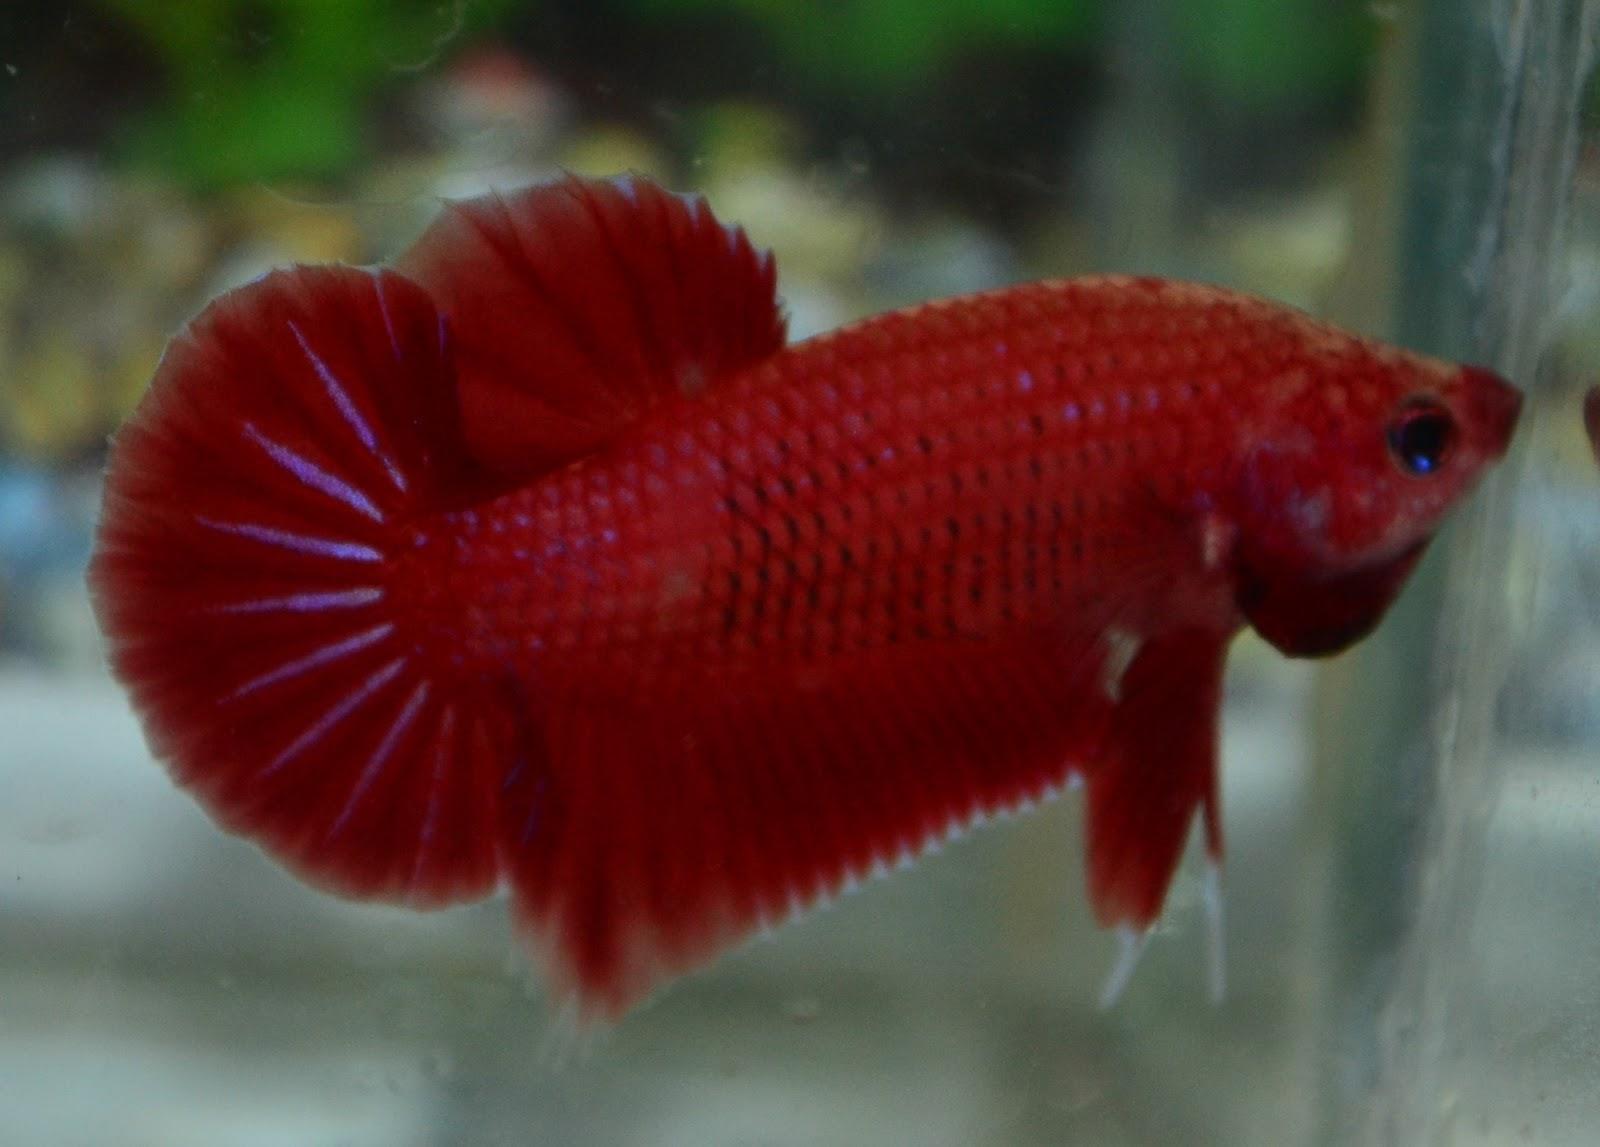 Betta fish afira betta nj cambodian red sold for Red betta fish